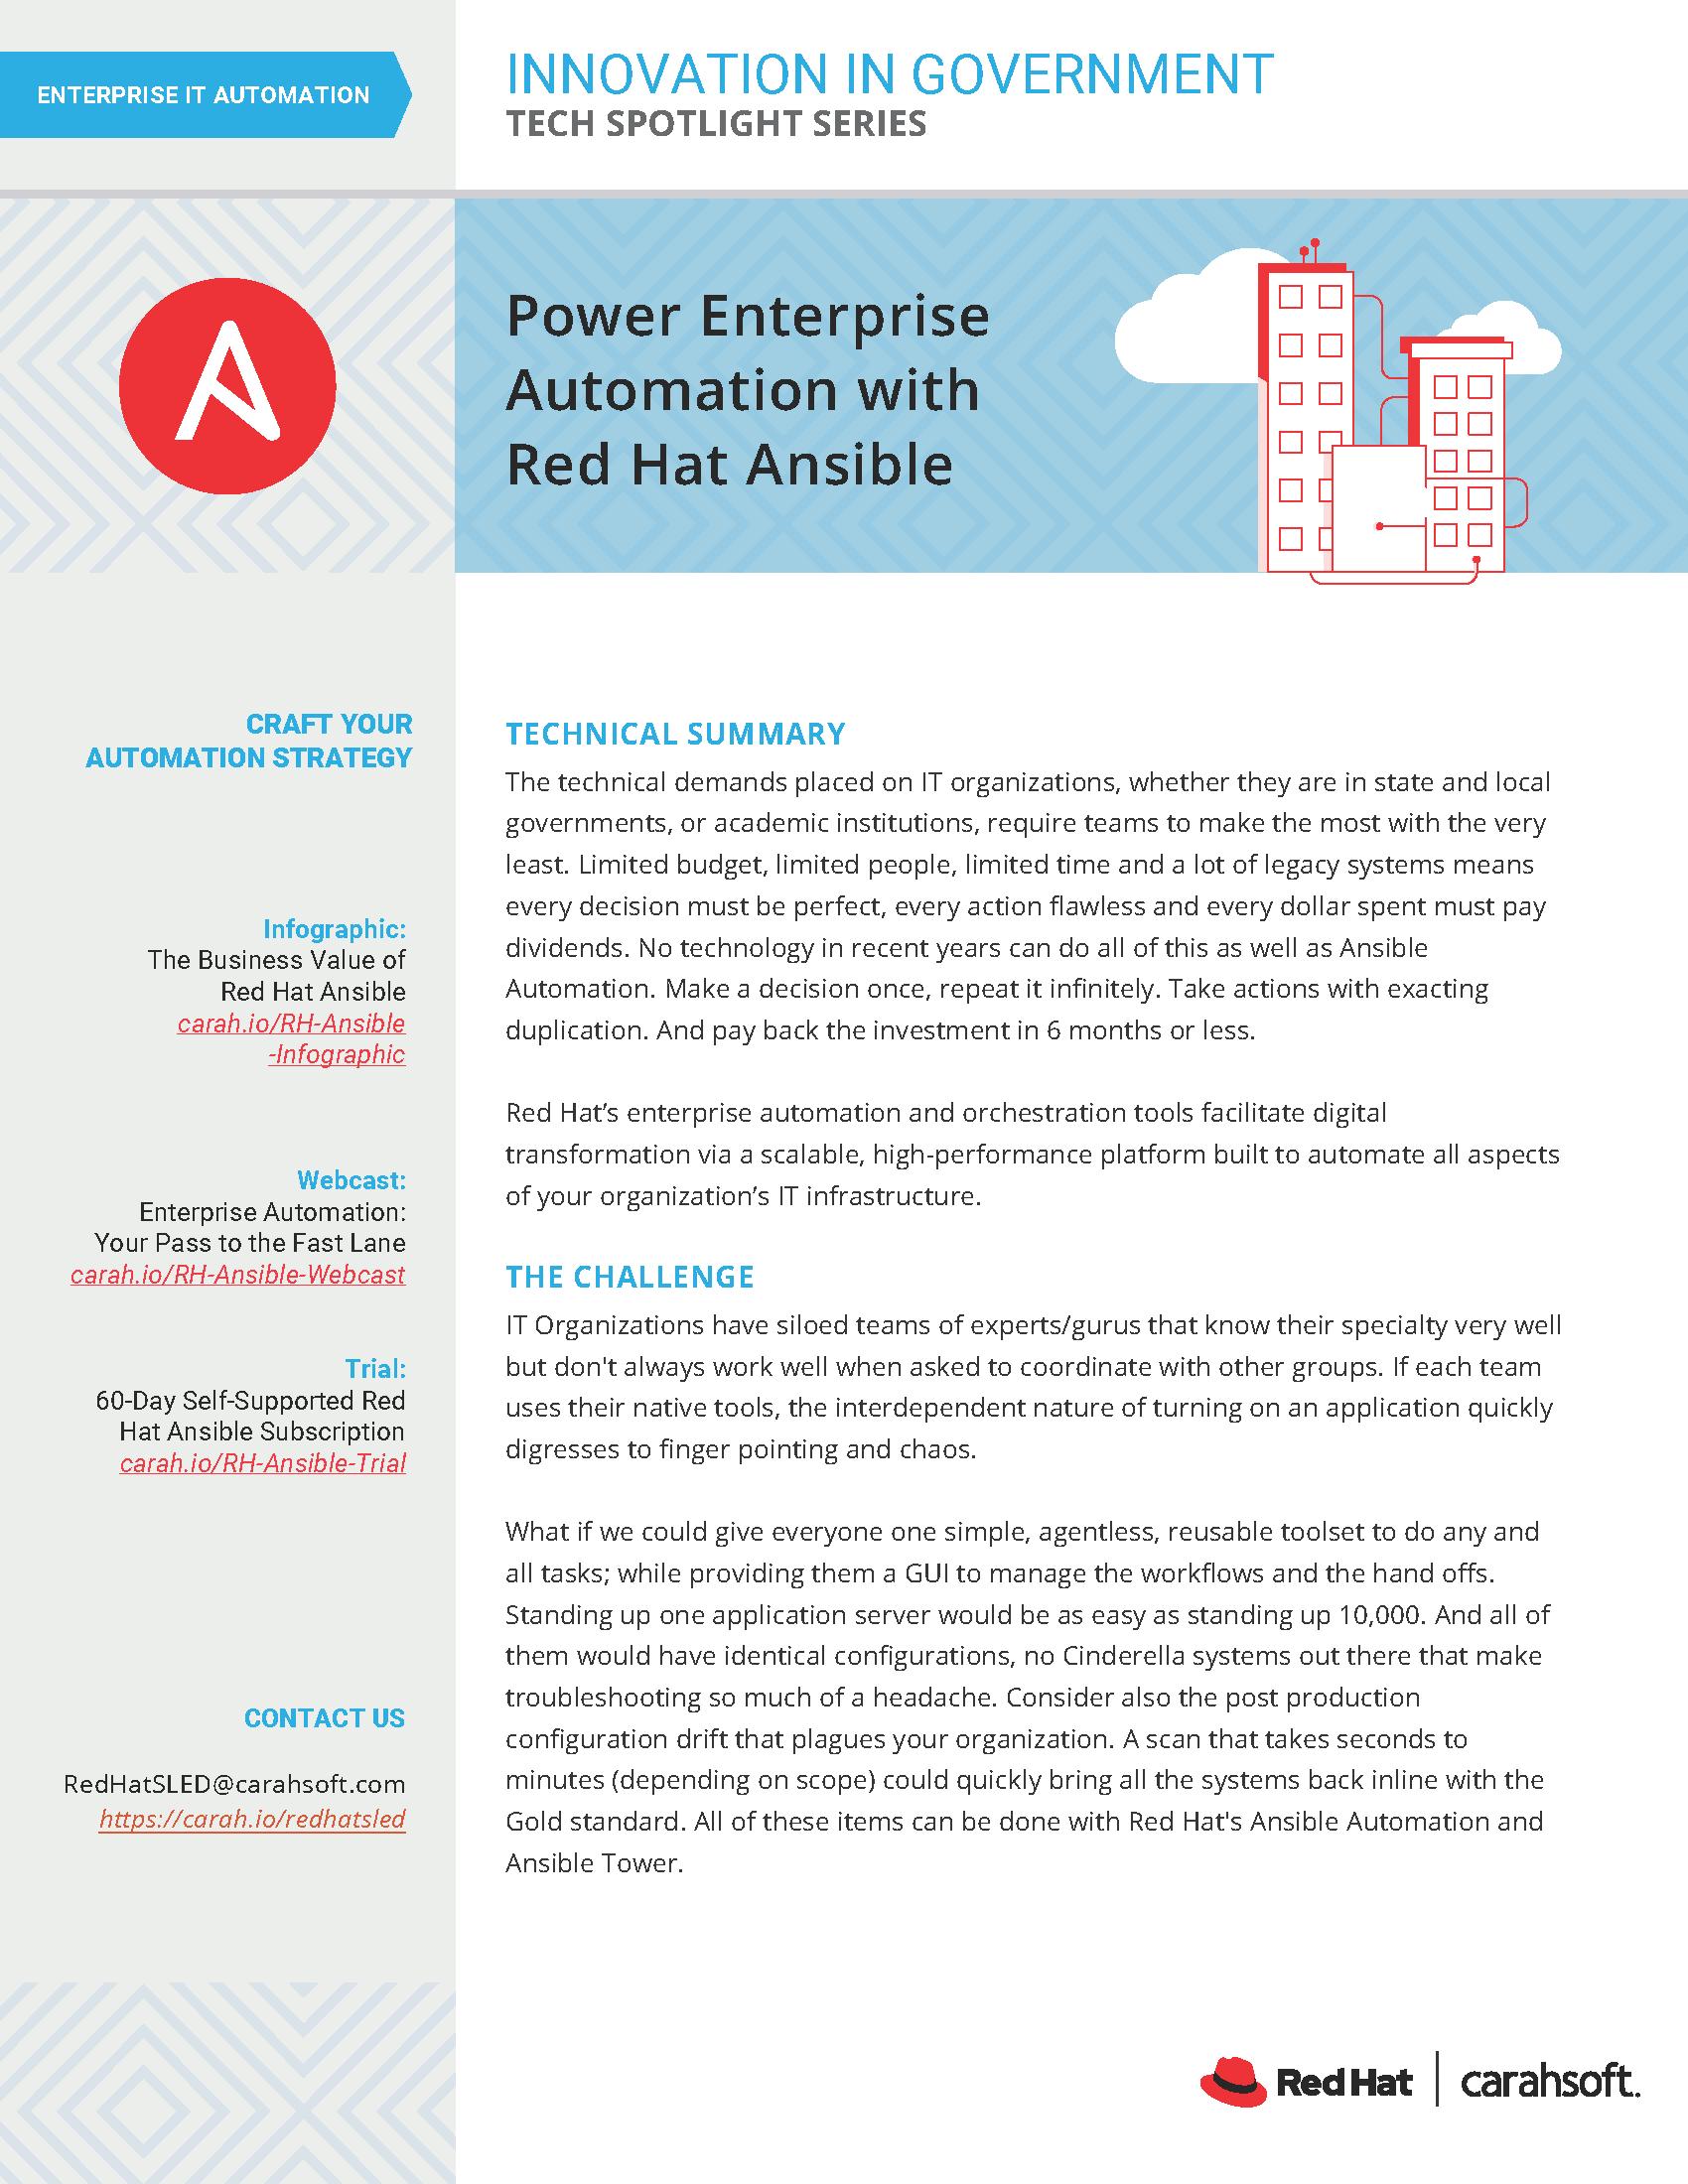 Tech Spotlight Red Hat Enterprise Power Automation Ansible Graphic